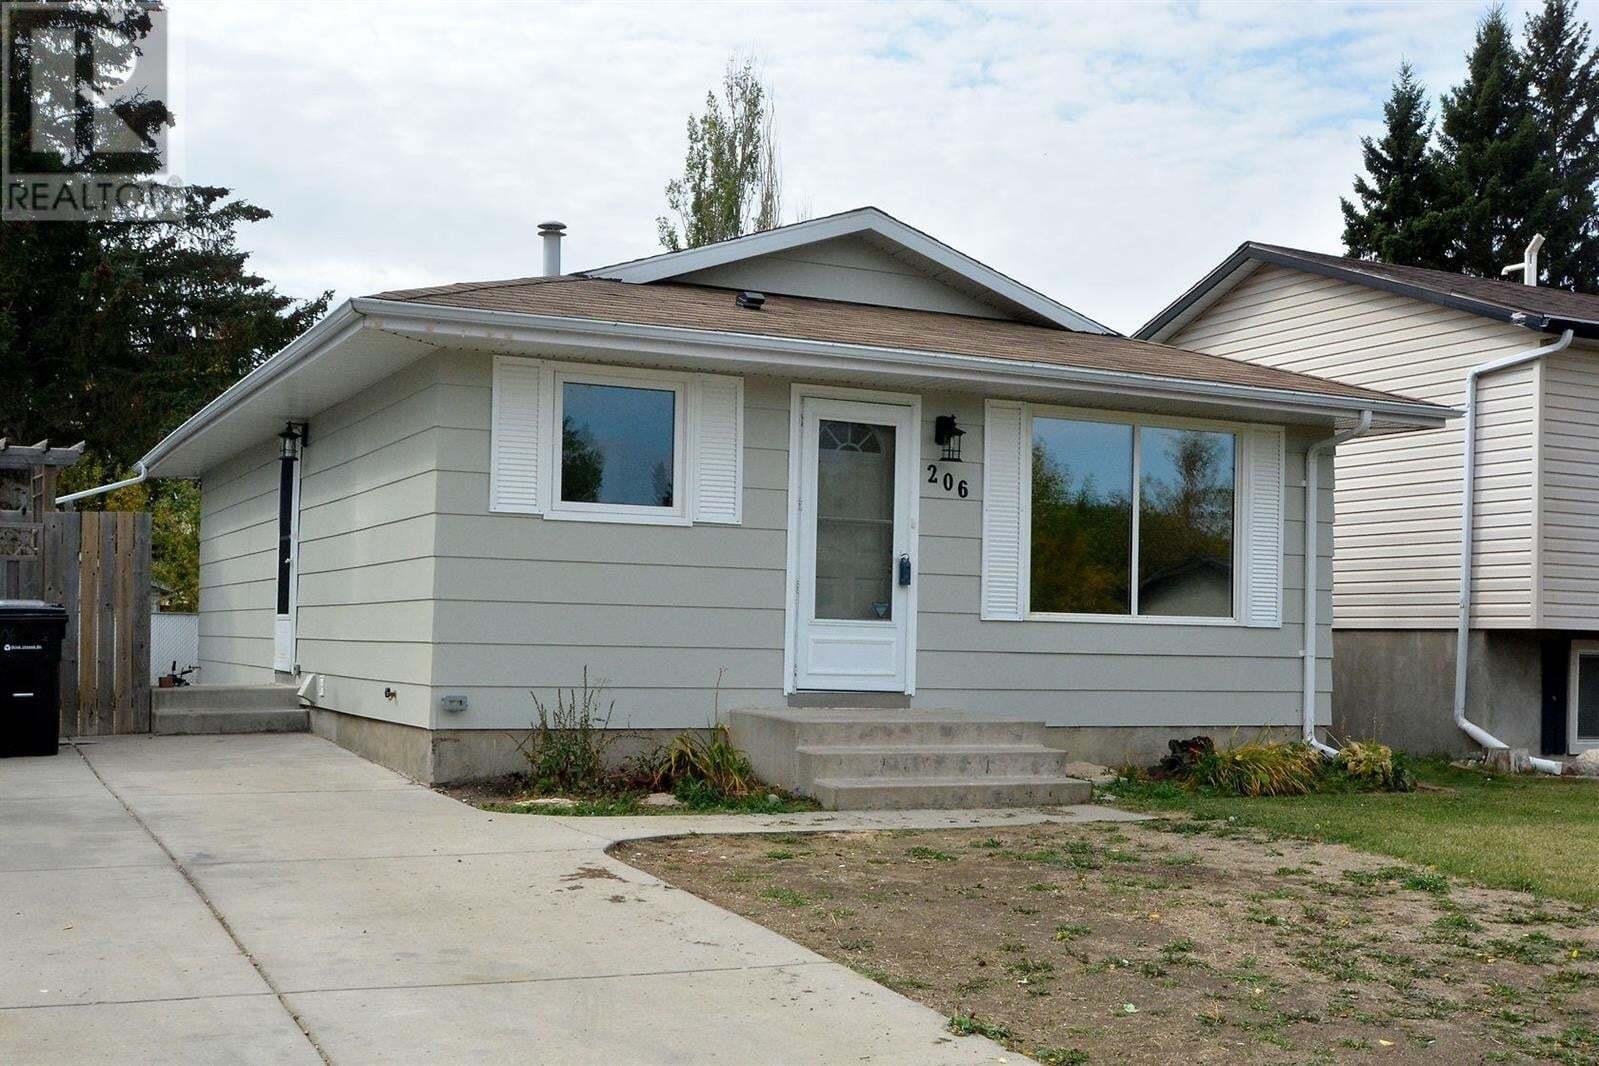 House for sale at 206 Waterloo Cres Saskatoon Saskatchewan - MLS: SK827785